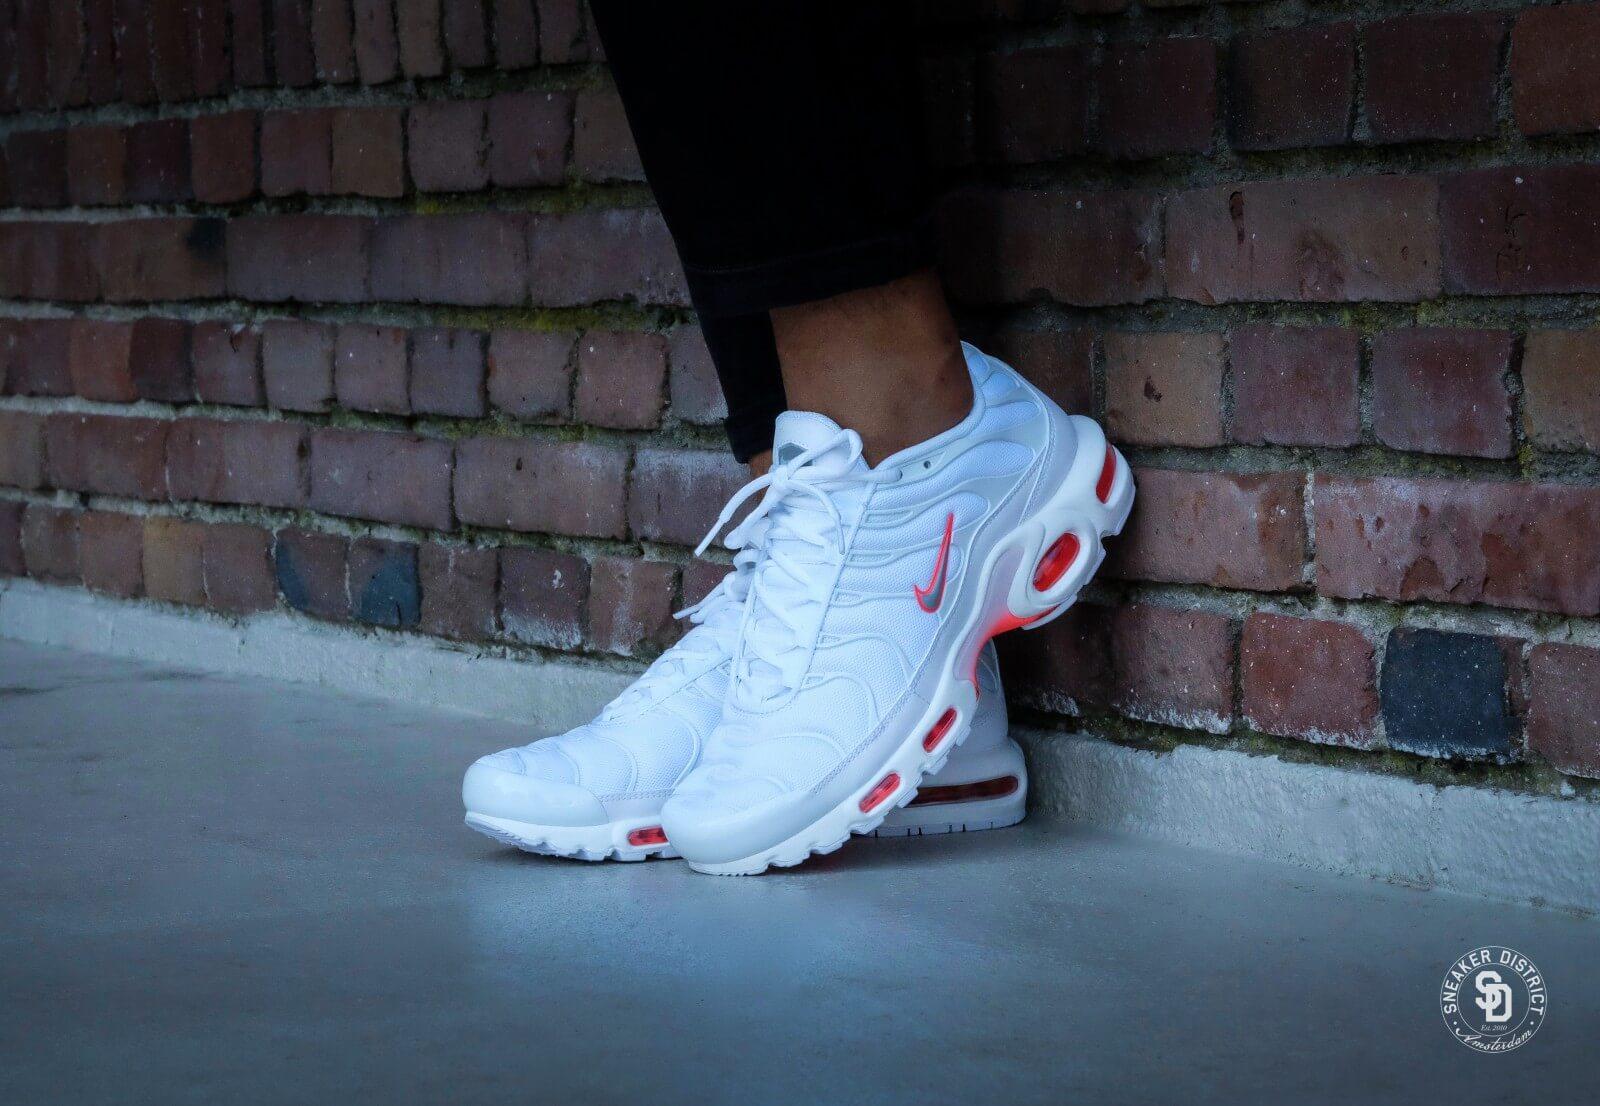 Nike Air Max Plus White Wolf Grey Bright Crimson 852630 101